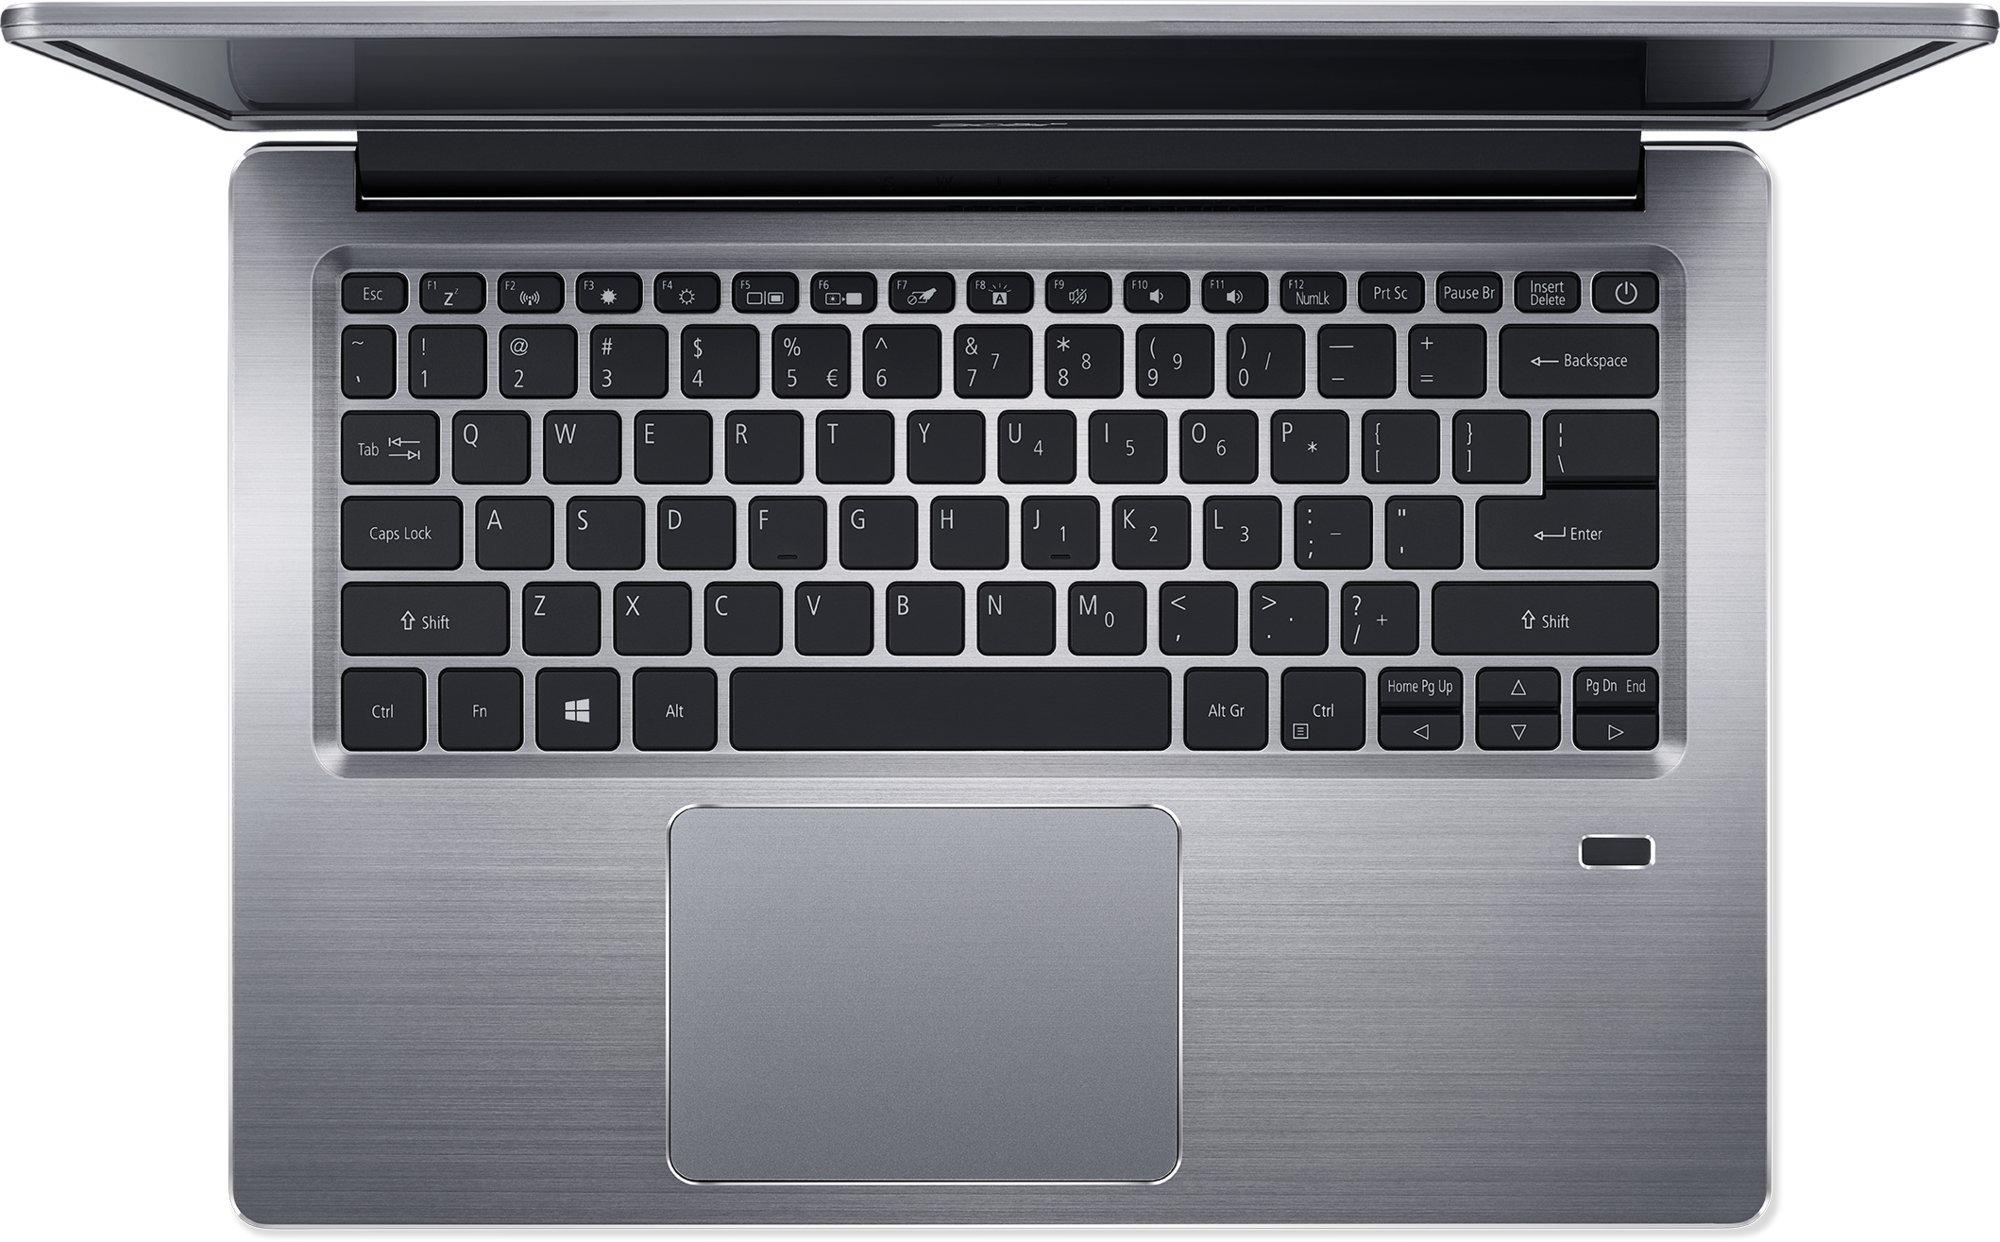 Acer Swift 3 SF314-54-55W7